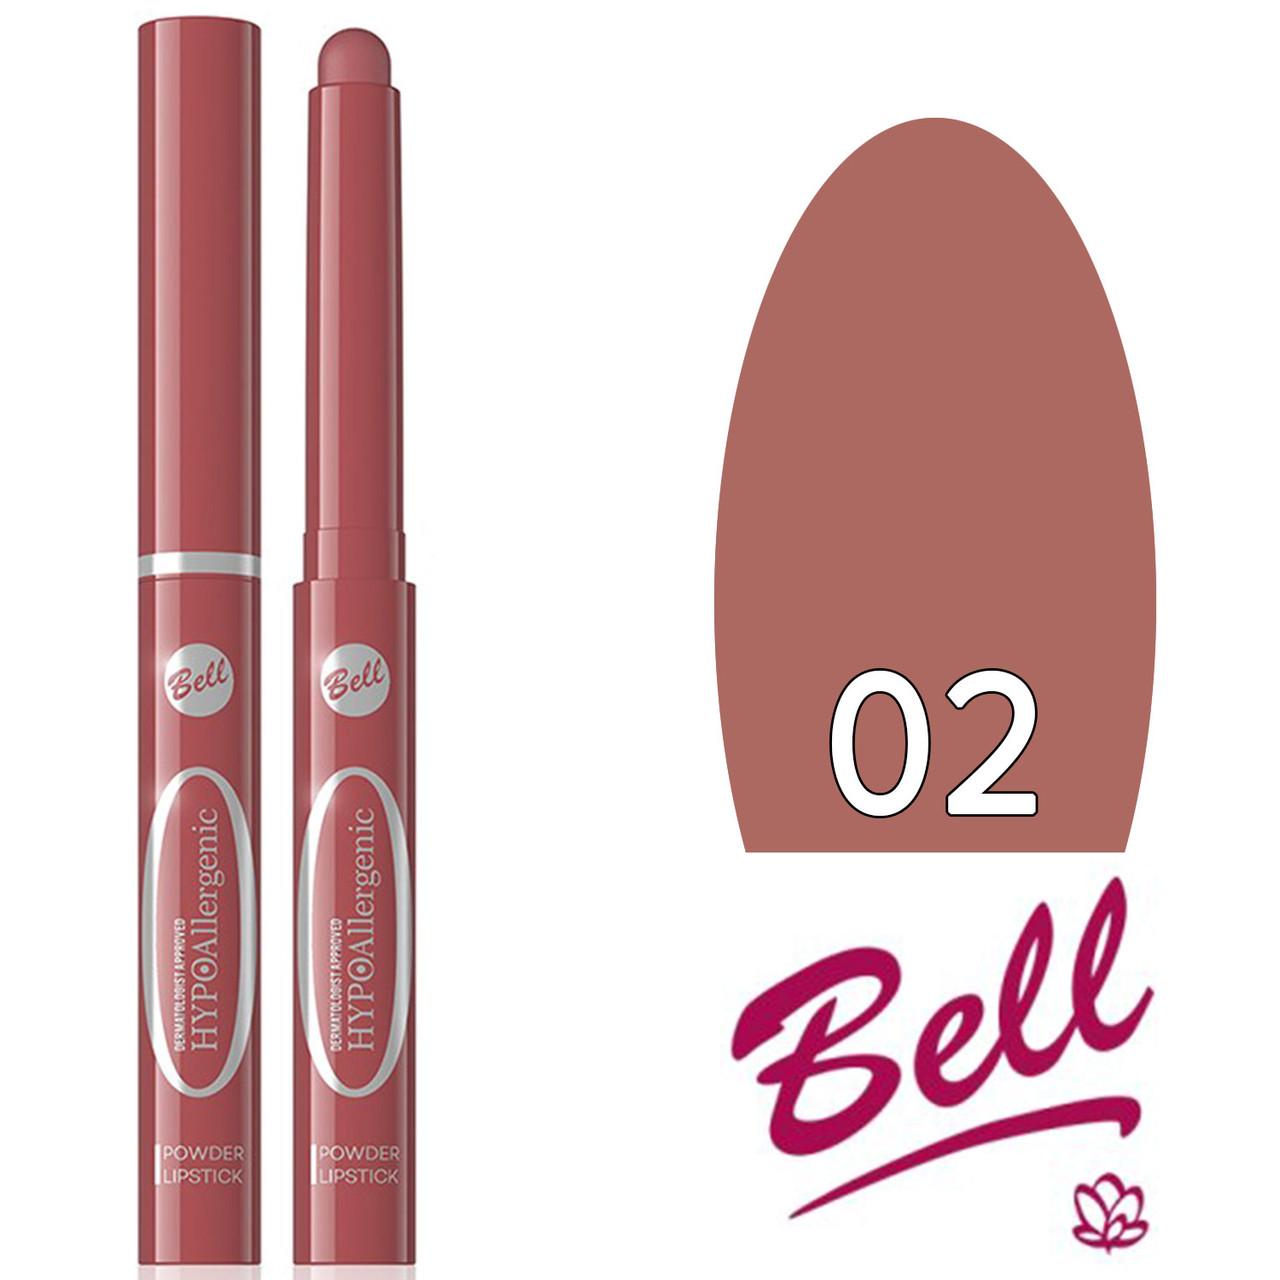 Bell HypoAllergenic - Губная помада Powder Lipstick Тон 02 pink natural матовая